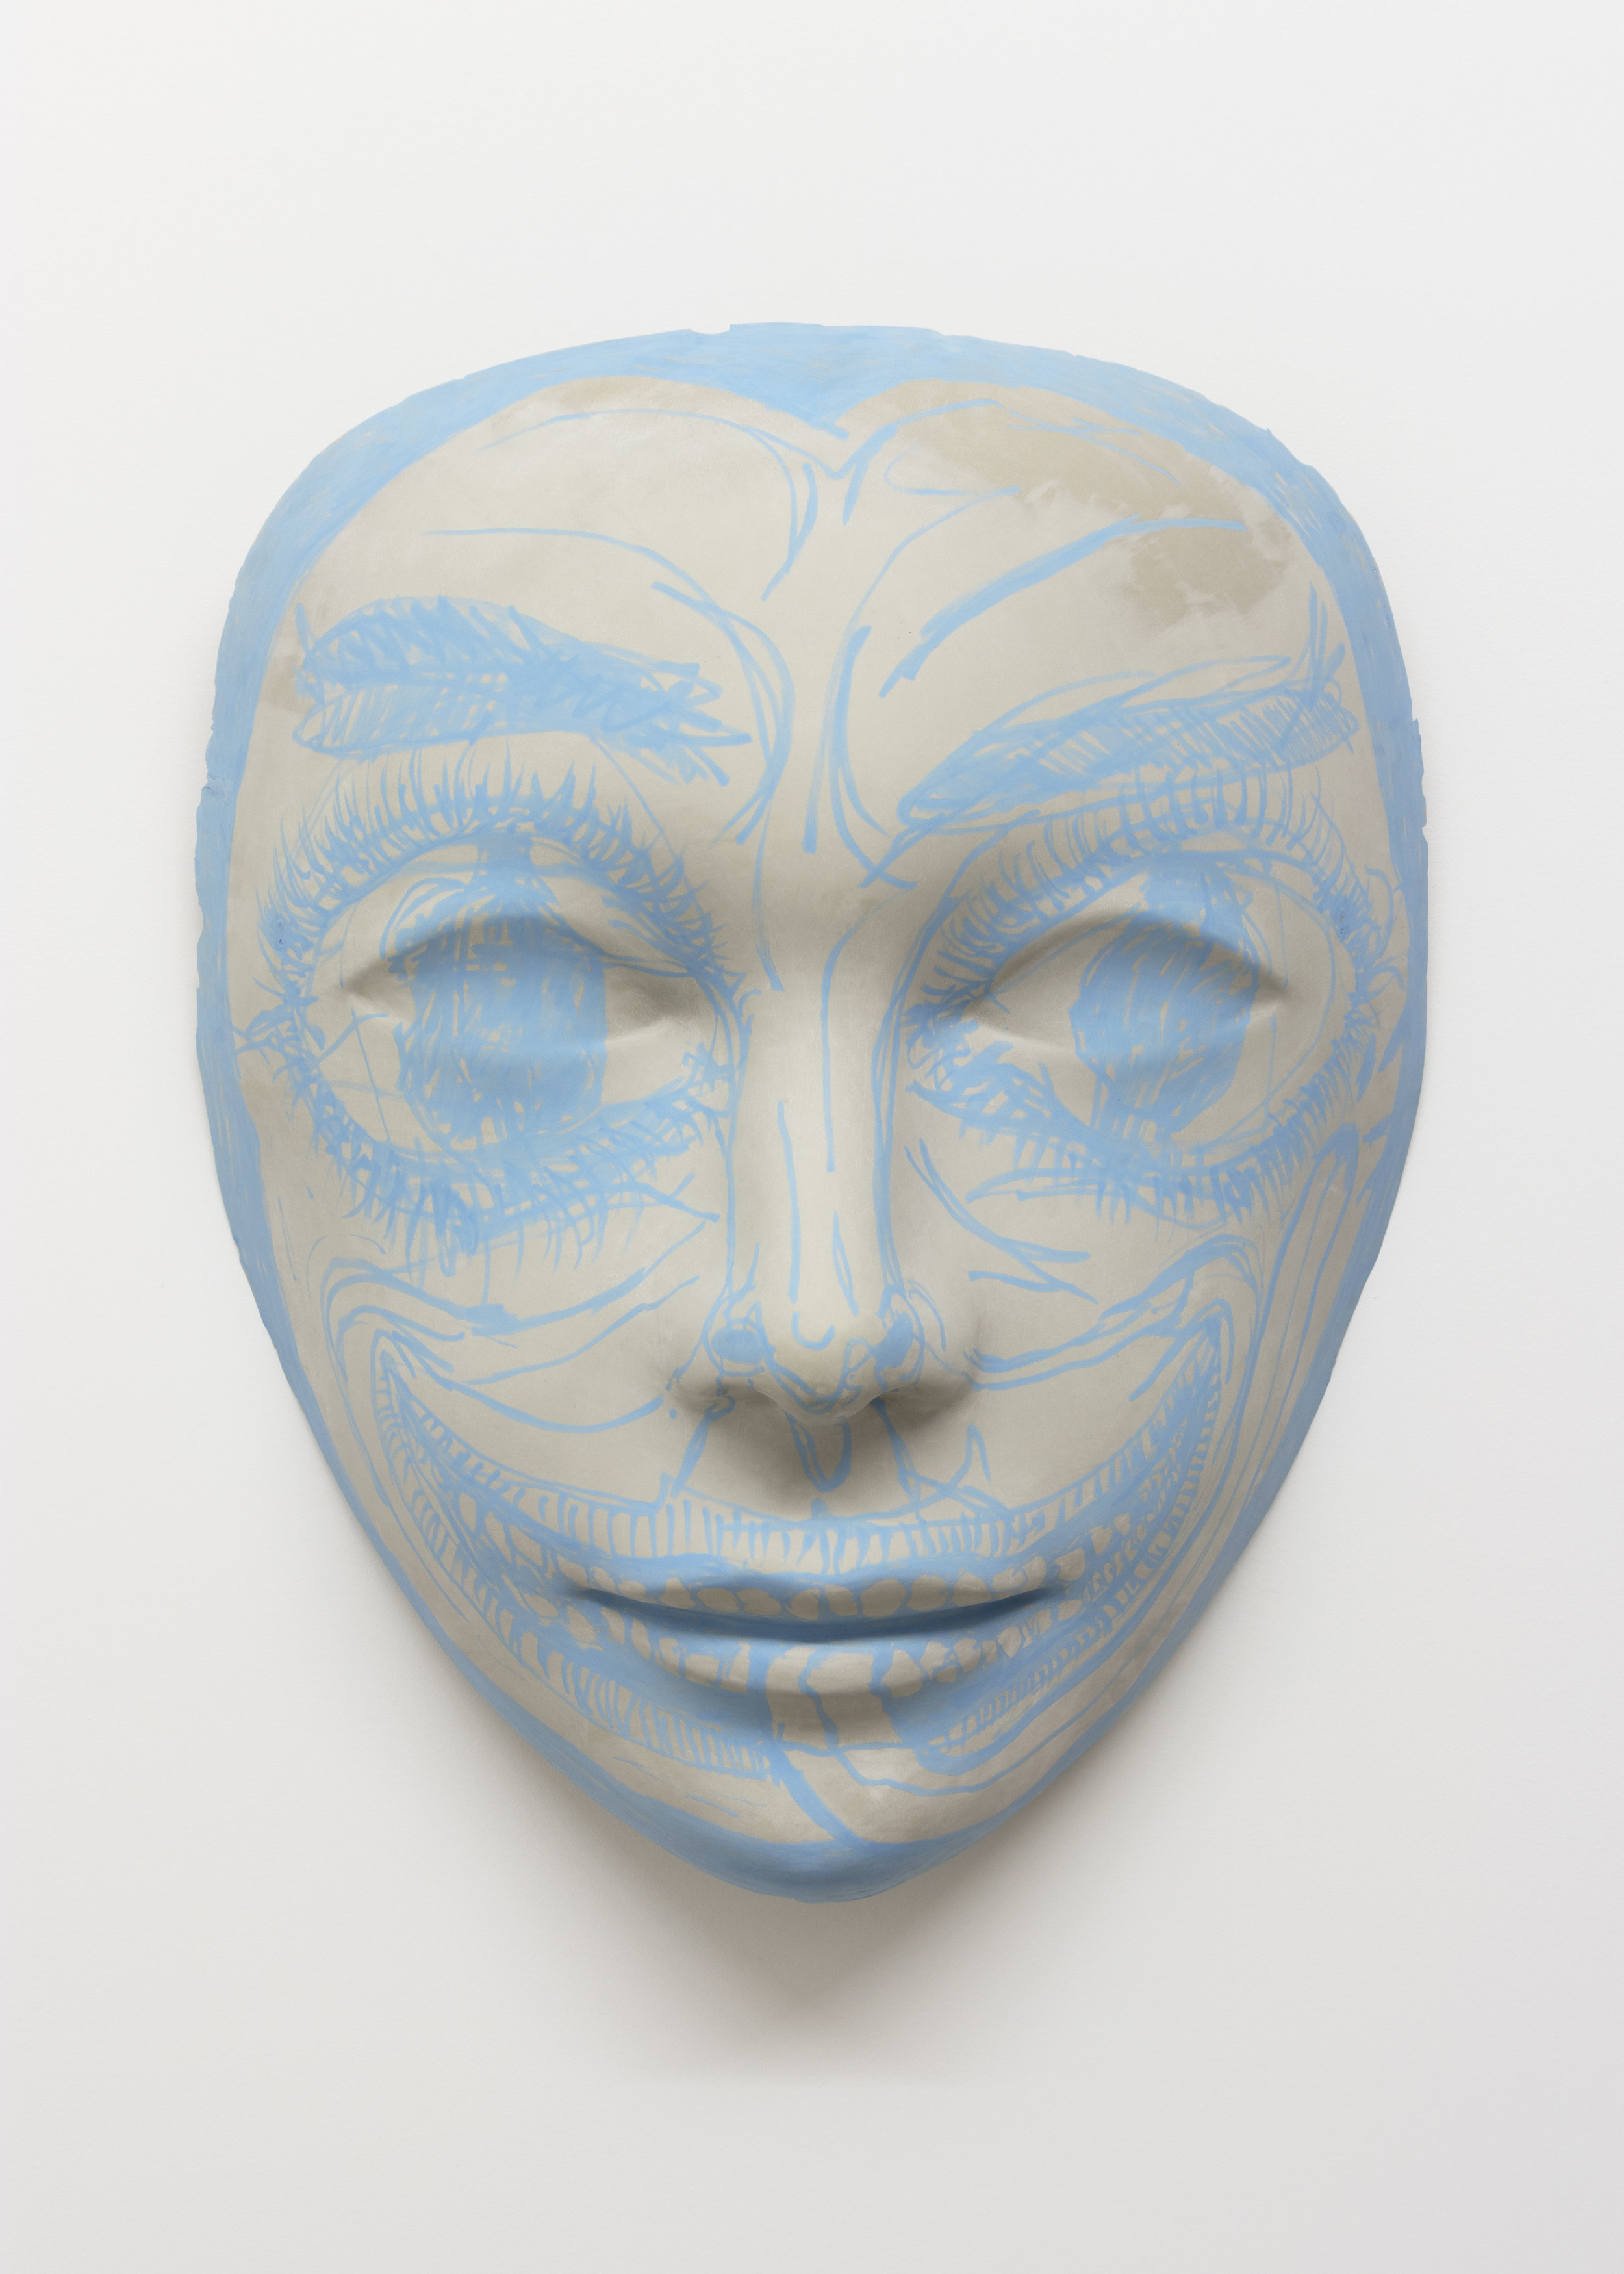 "Chloe Seibert,  Mask 3 , Urethane plastic, fiberglass, acrylic paint, 42 x 33 x 17"", 2019"